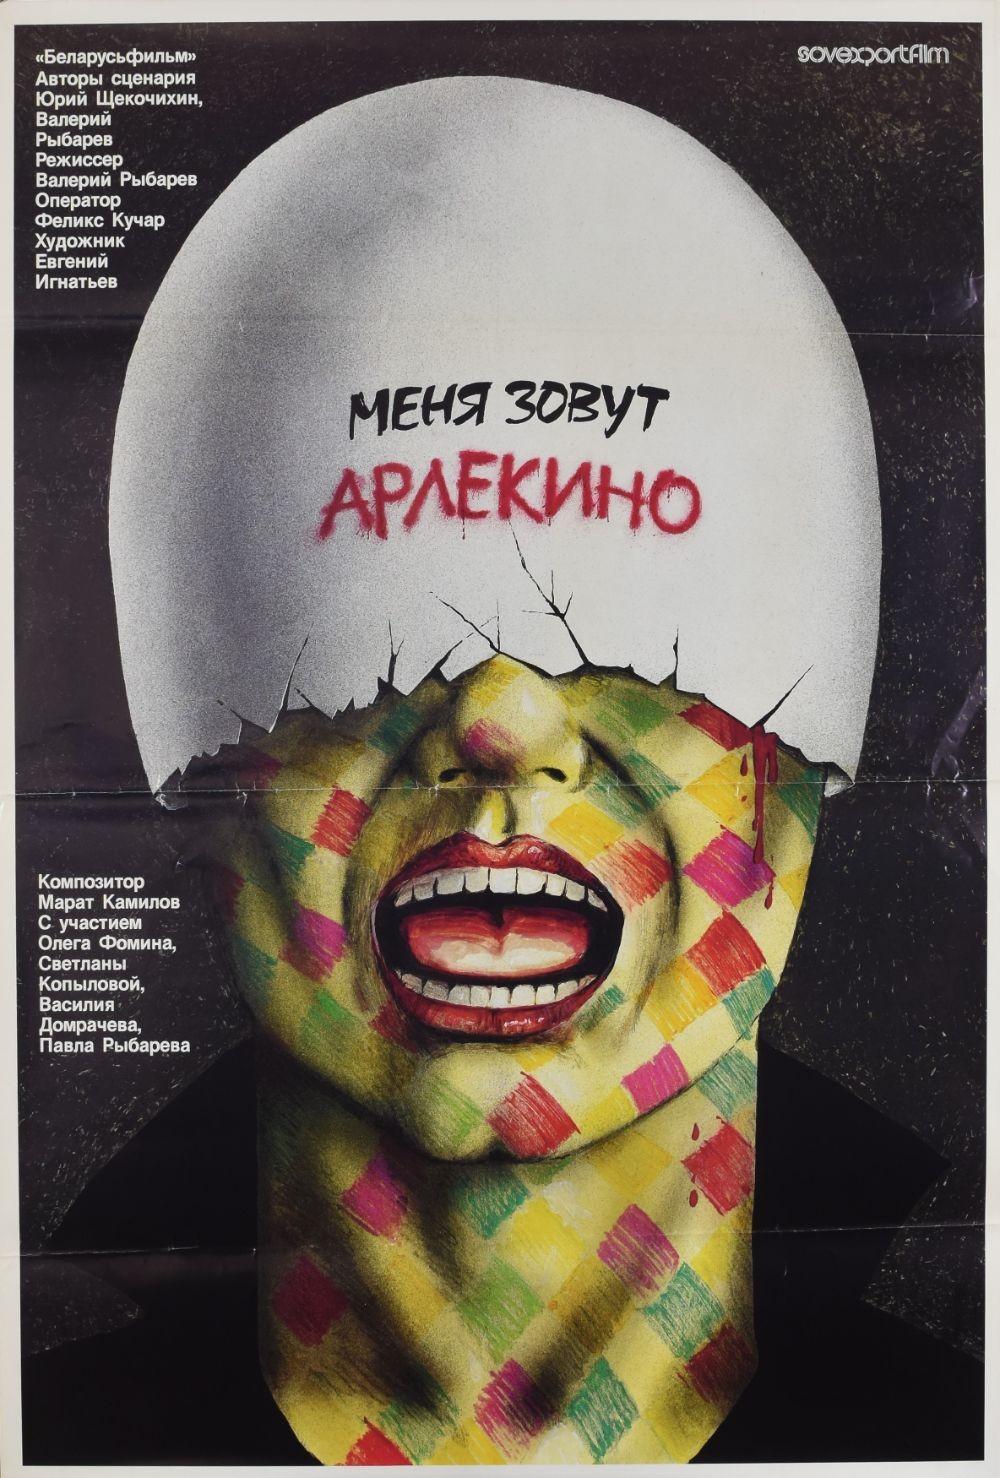 My Name Is Arlekino original movie poster